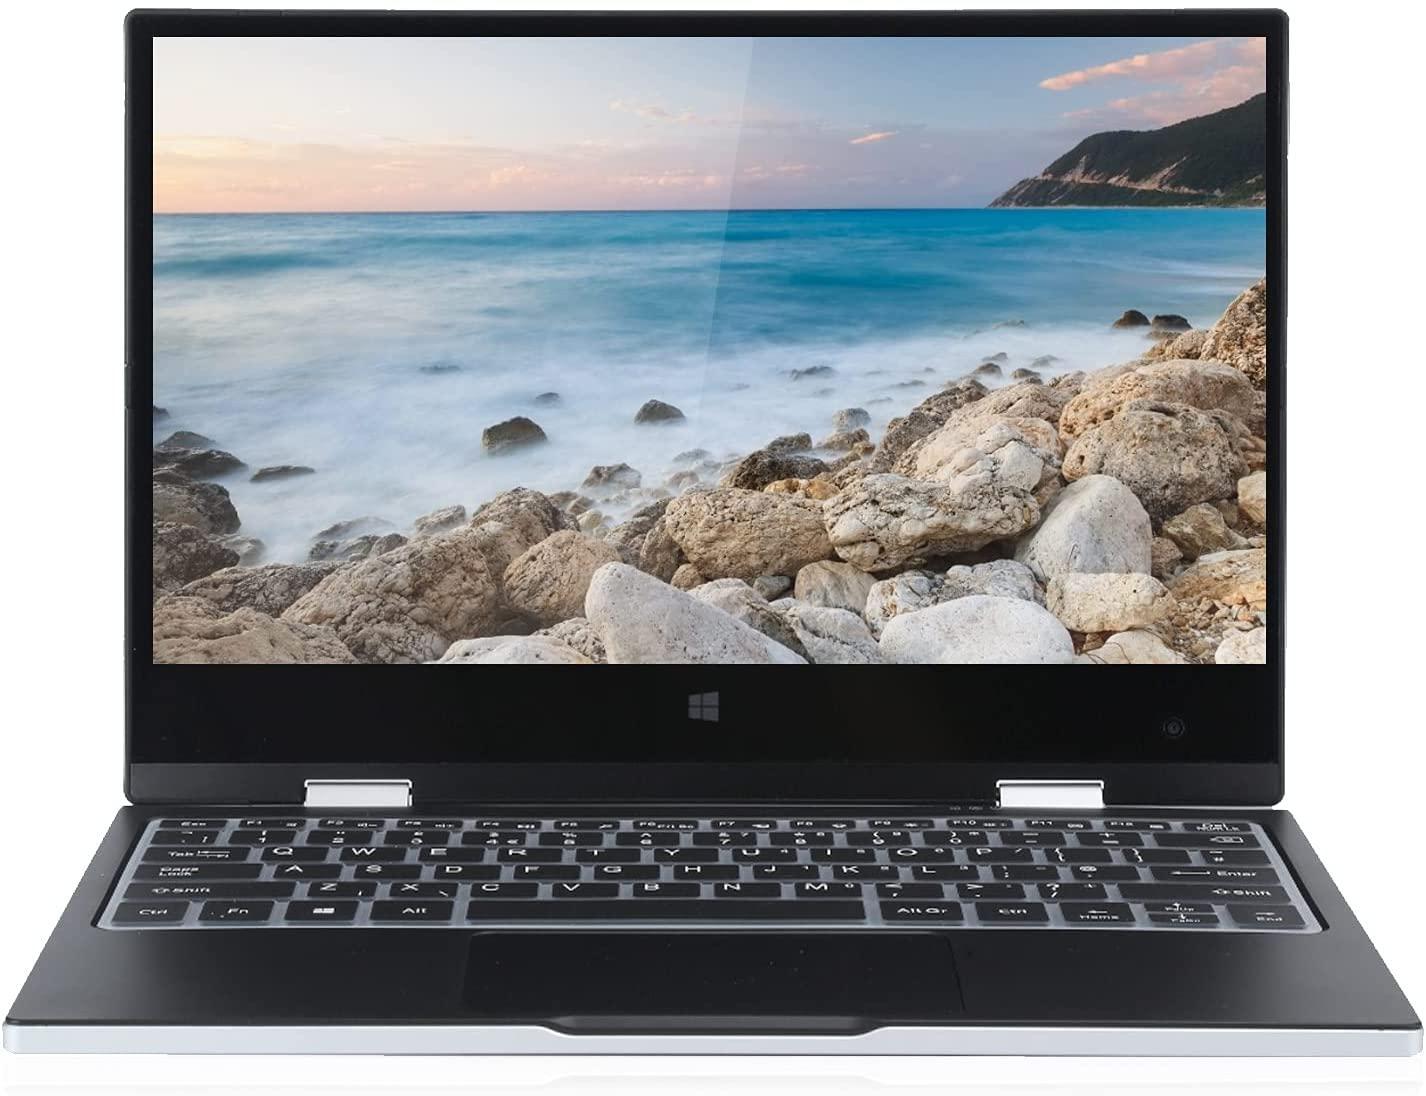 Tablet PC Jumper EZpad Pro 8 2 In 1 11.6 Inch IPS 1080P Laptop With Keyboard N3450 Quad Core 8GB DDR4 128GB Windows 10